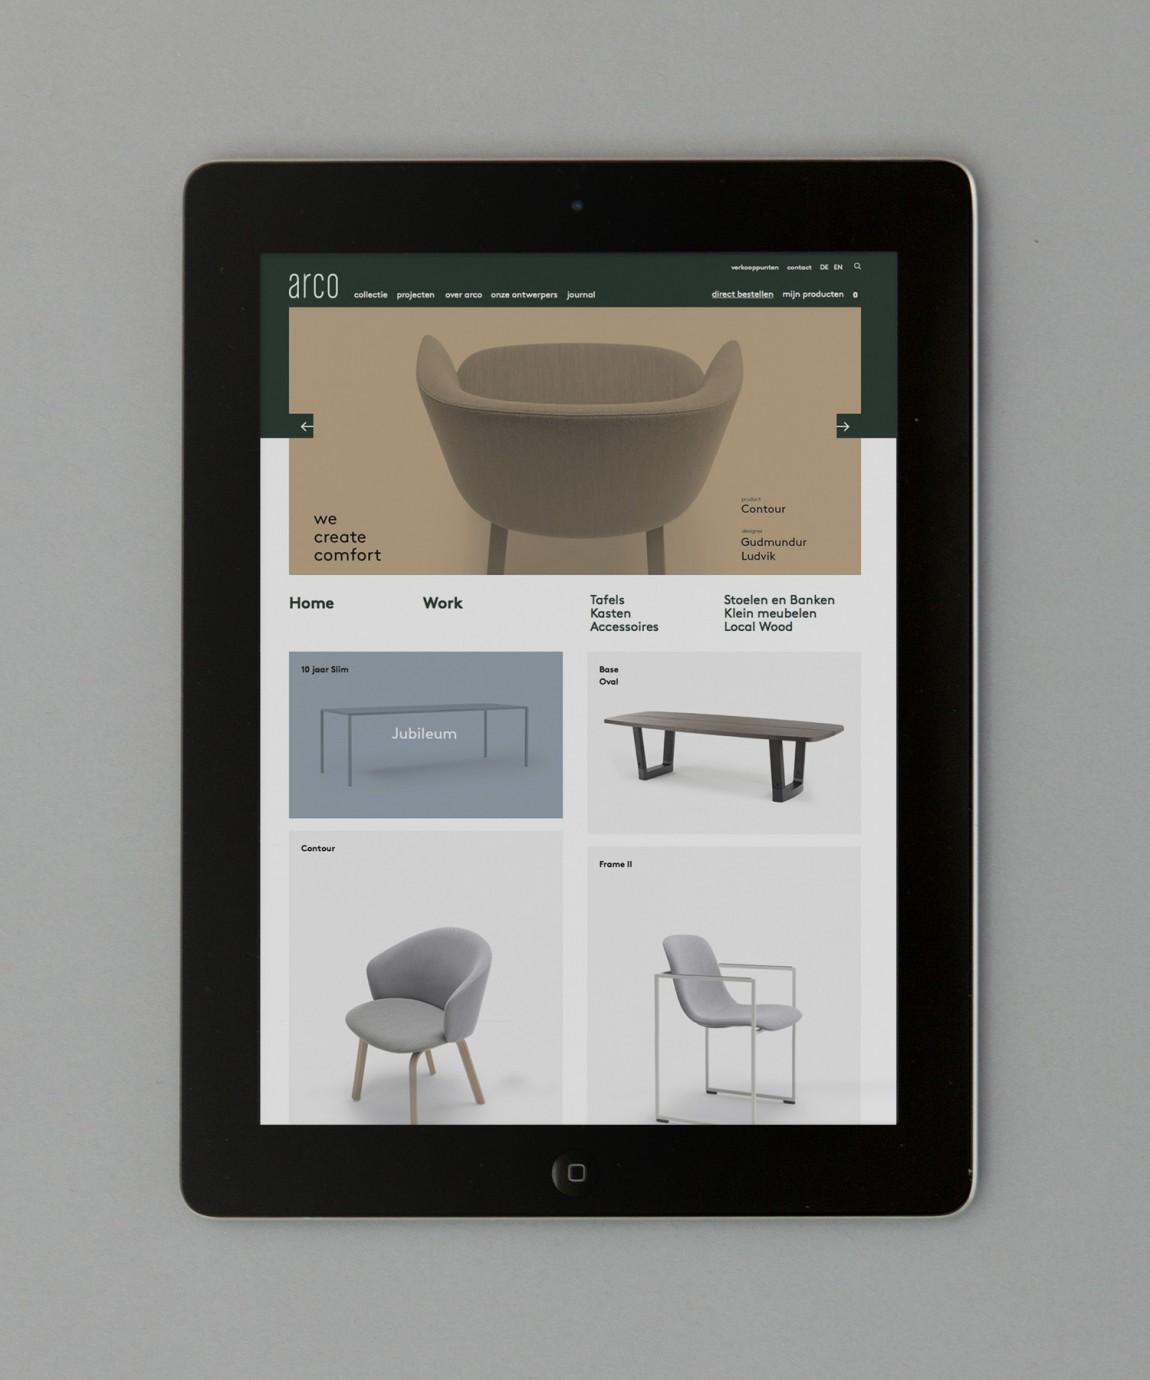 Arco家具设计制造公司VI企业形象设计,自适应网站设计